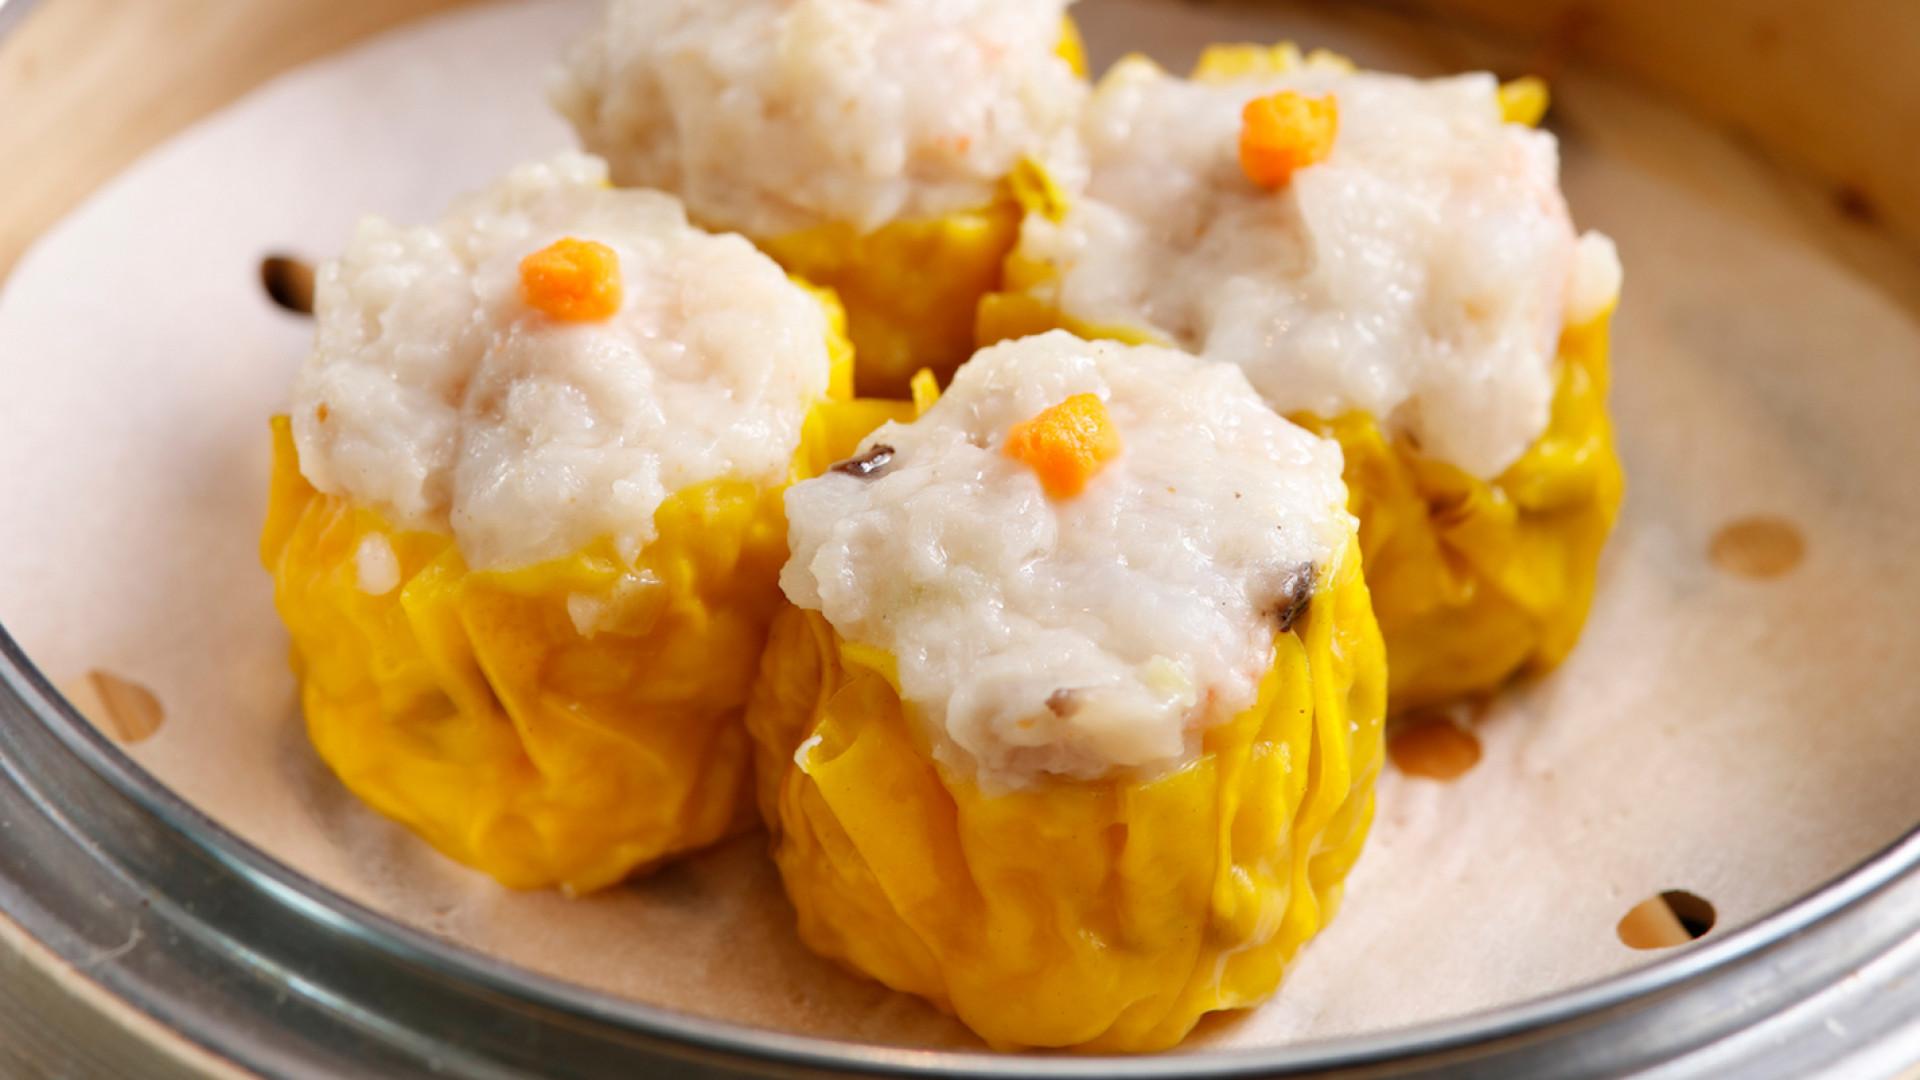 Siew mai dumplings